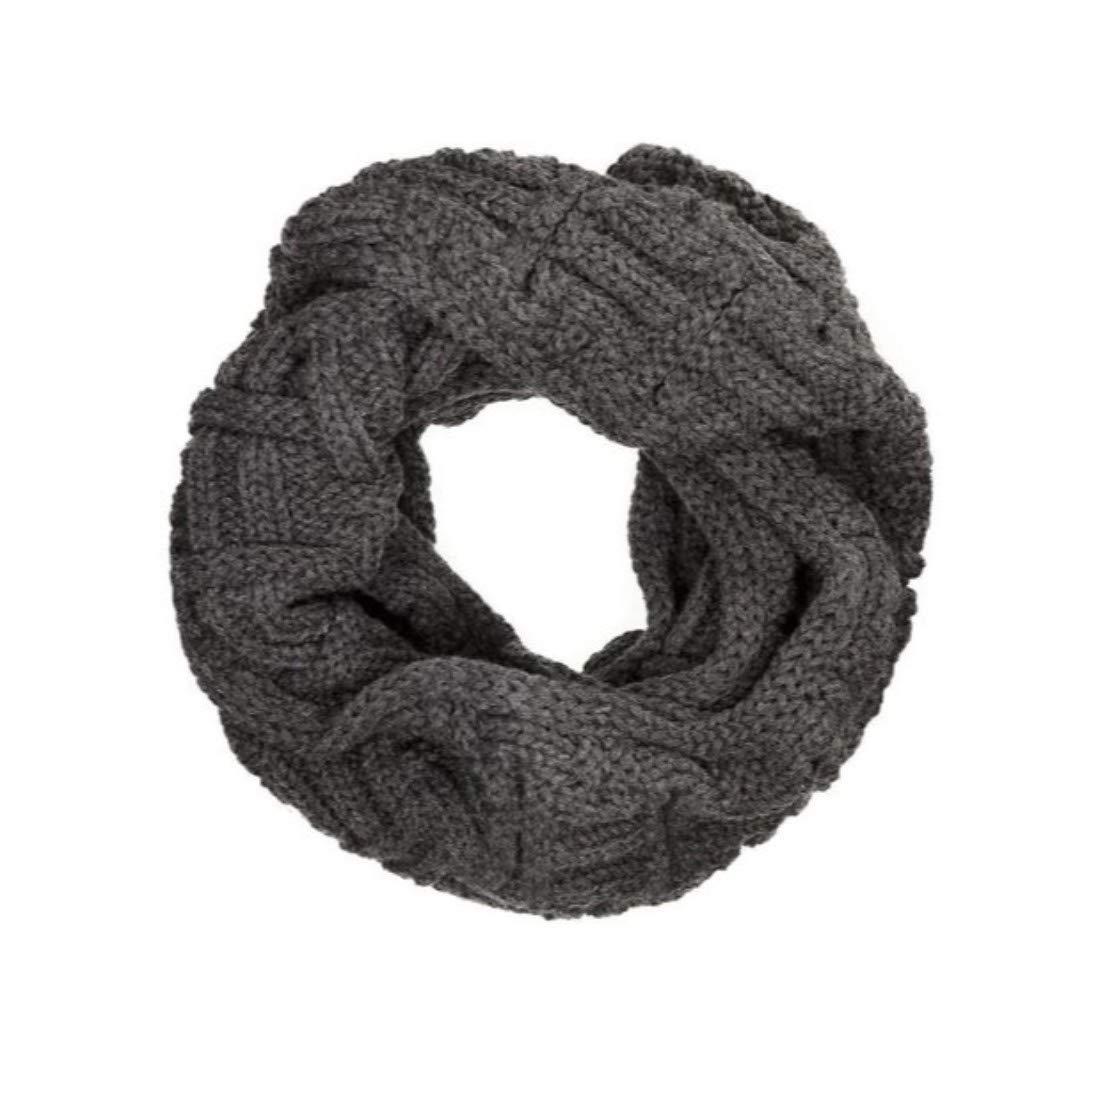 Knit Pattern, Aran Cashmere Scarf - 1000 Free Patterns